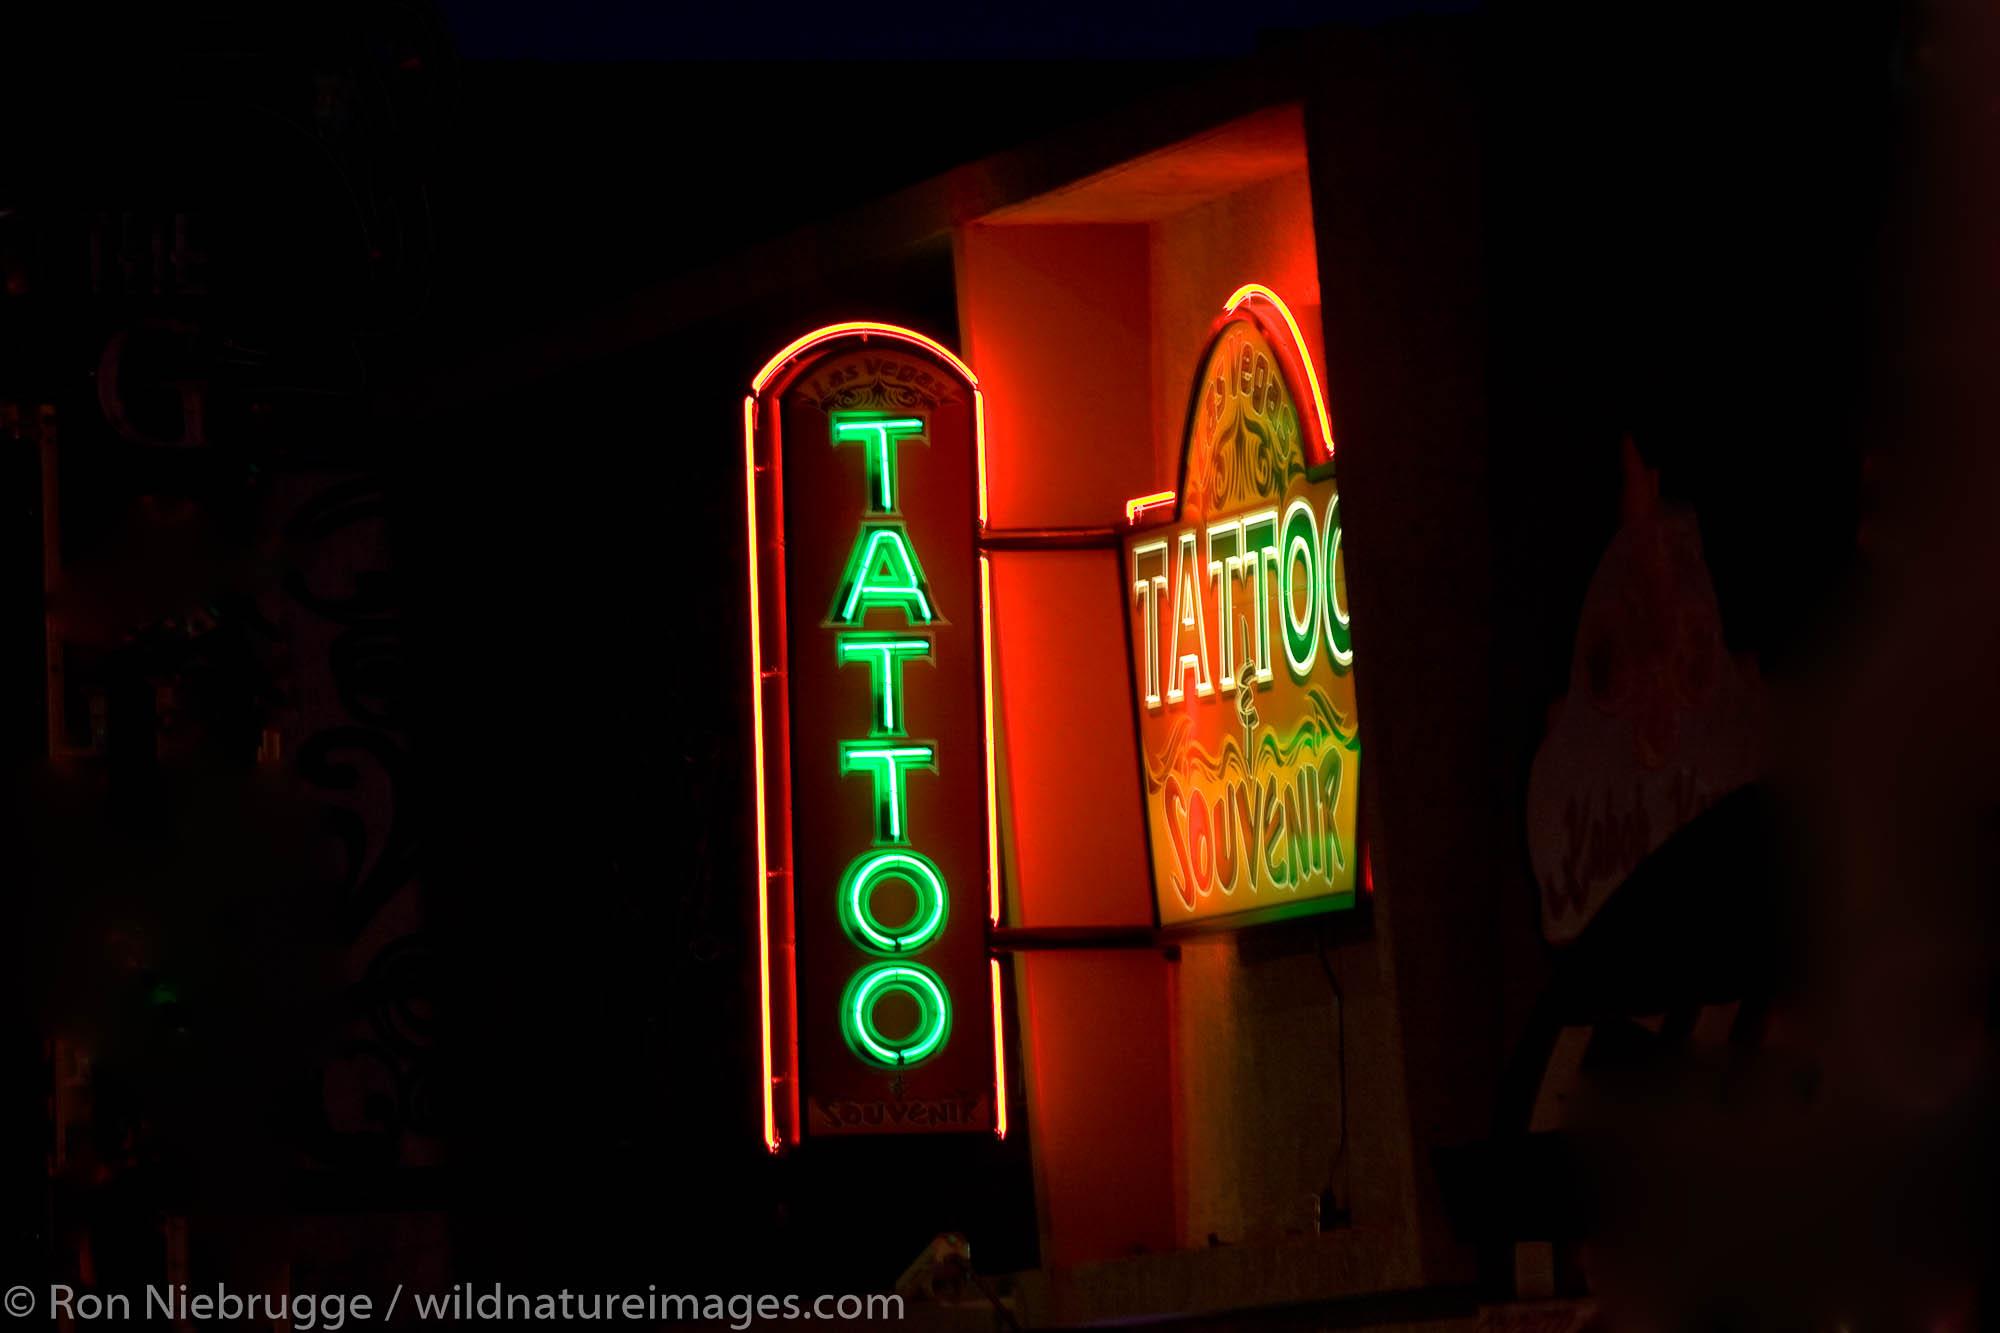 Tattoo neon sign, downtown Las Vegas, Nevada.